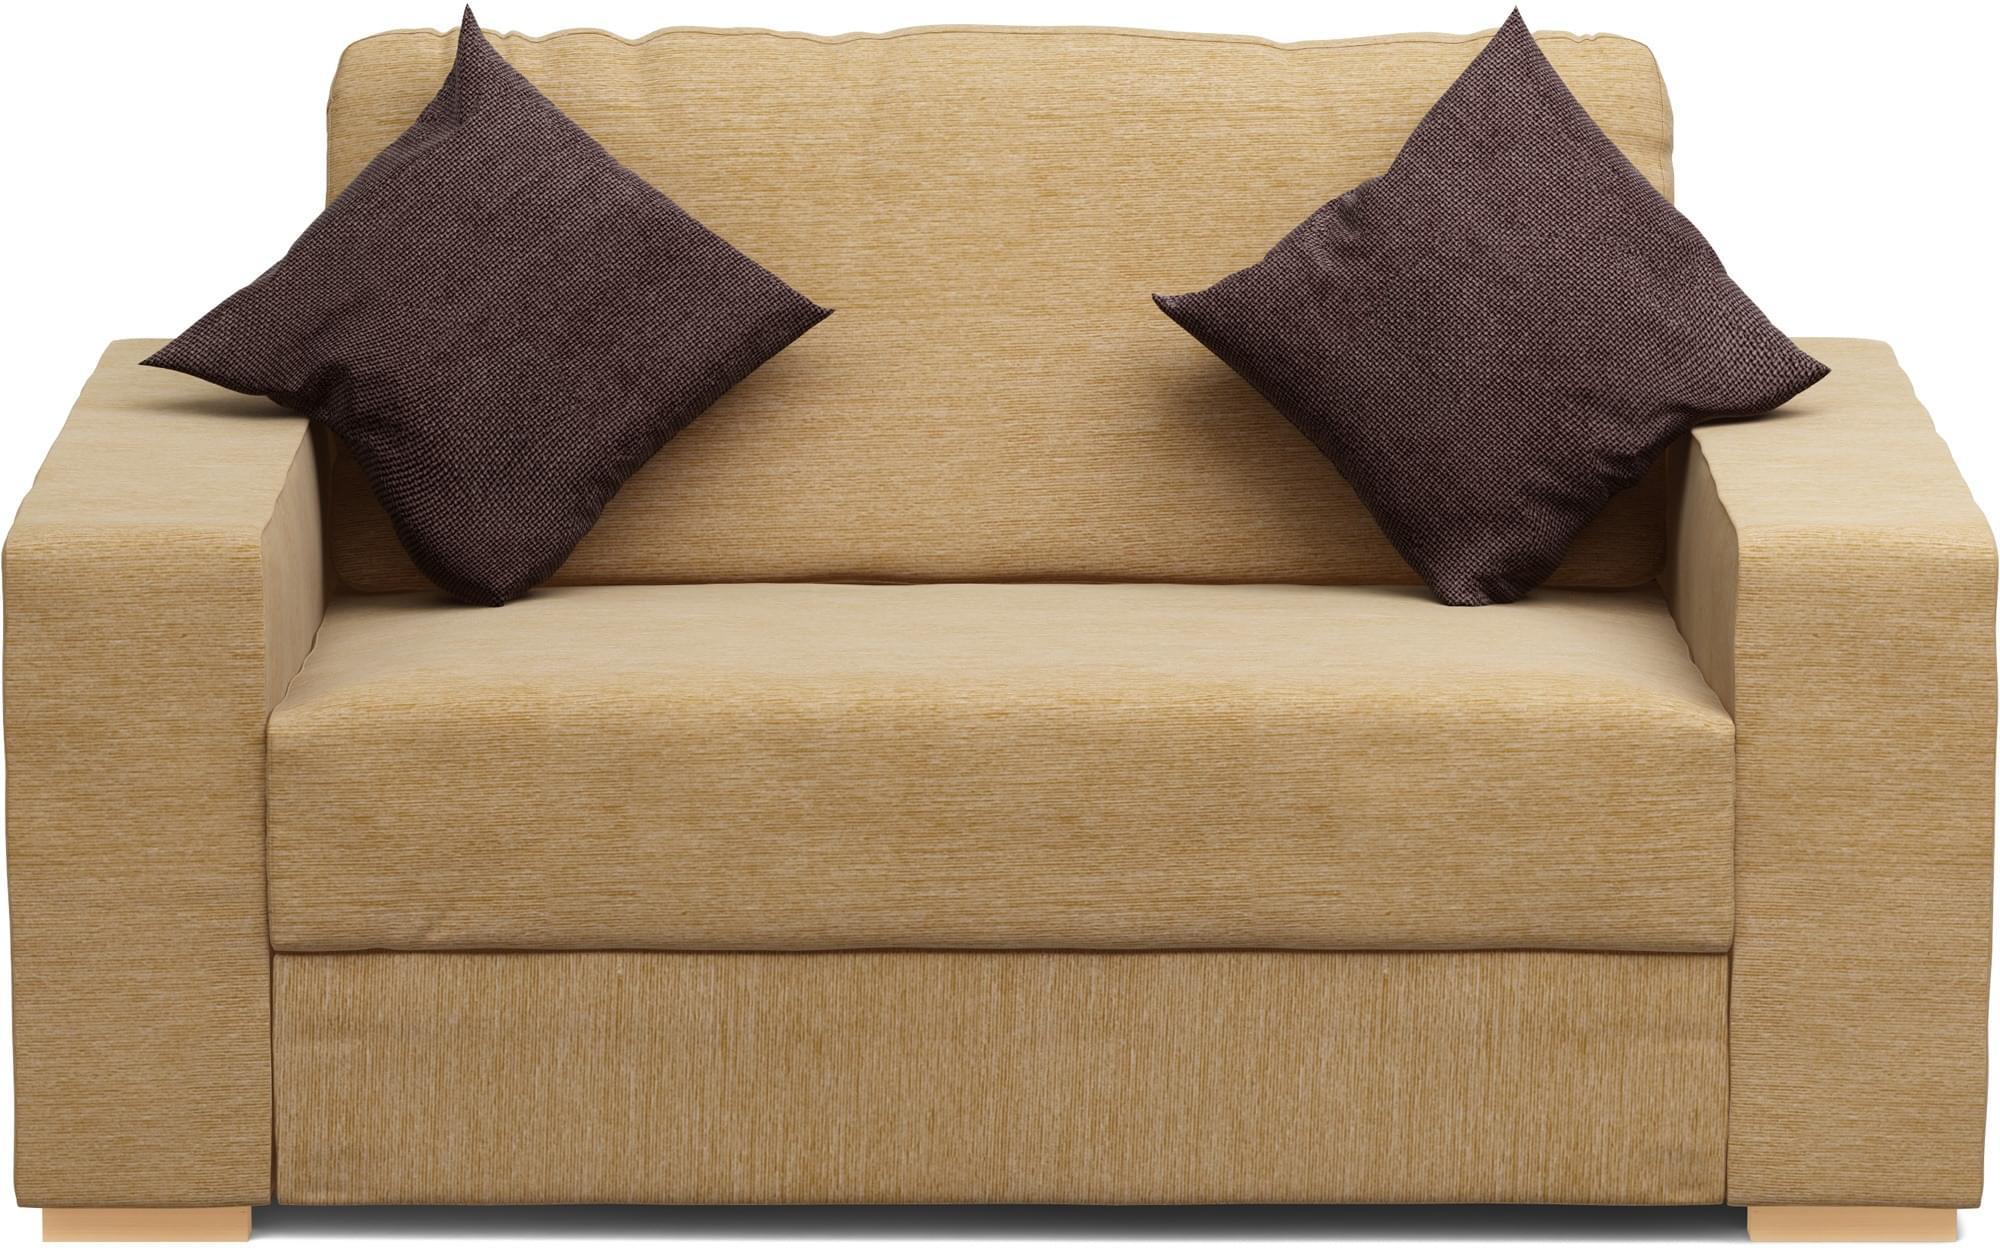 Xia 1 Seat Sofa Bed Small Sofa Beds Uk Nabru